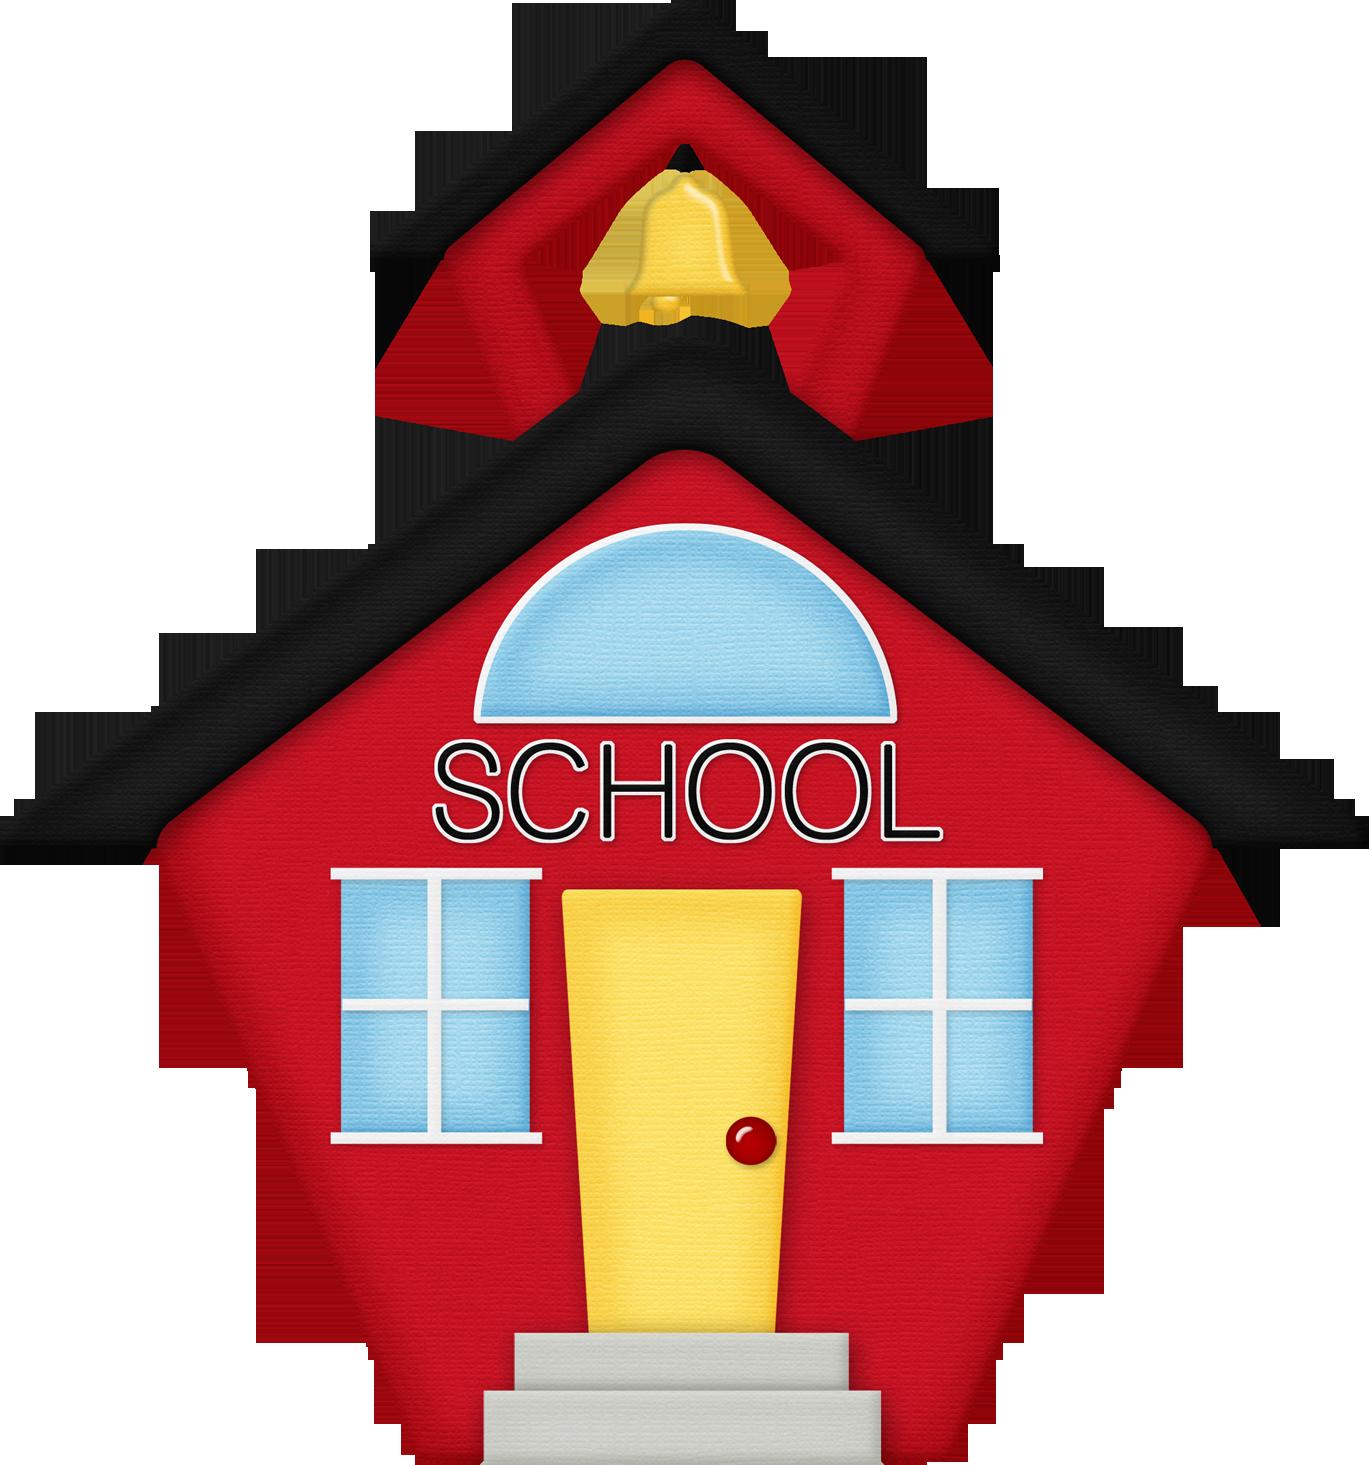 free png School Clipart images transparent